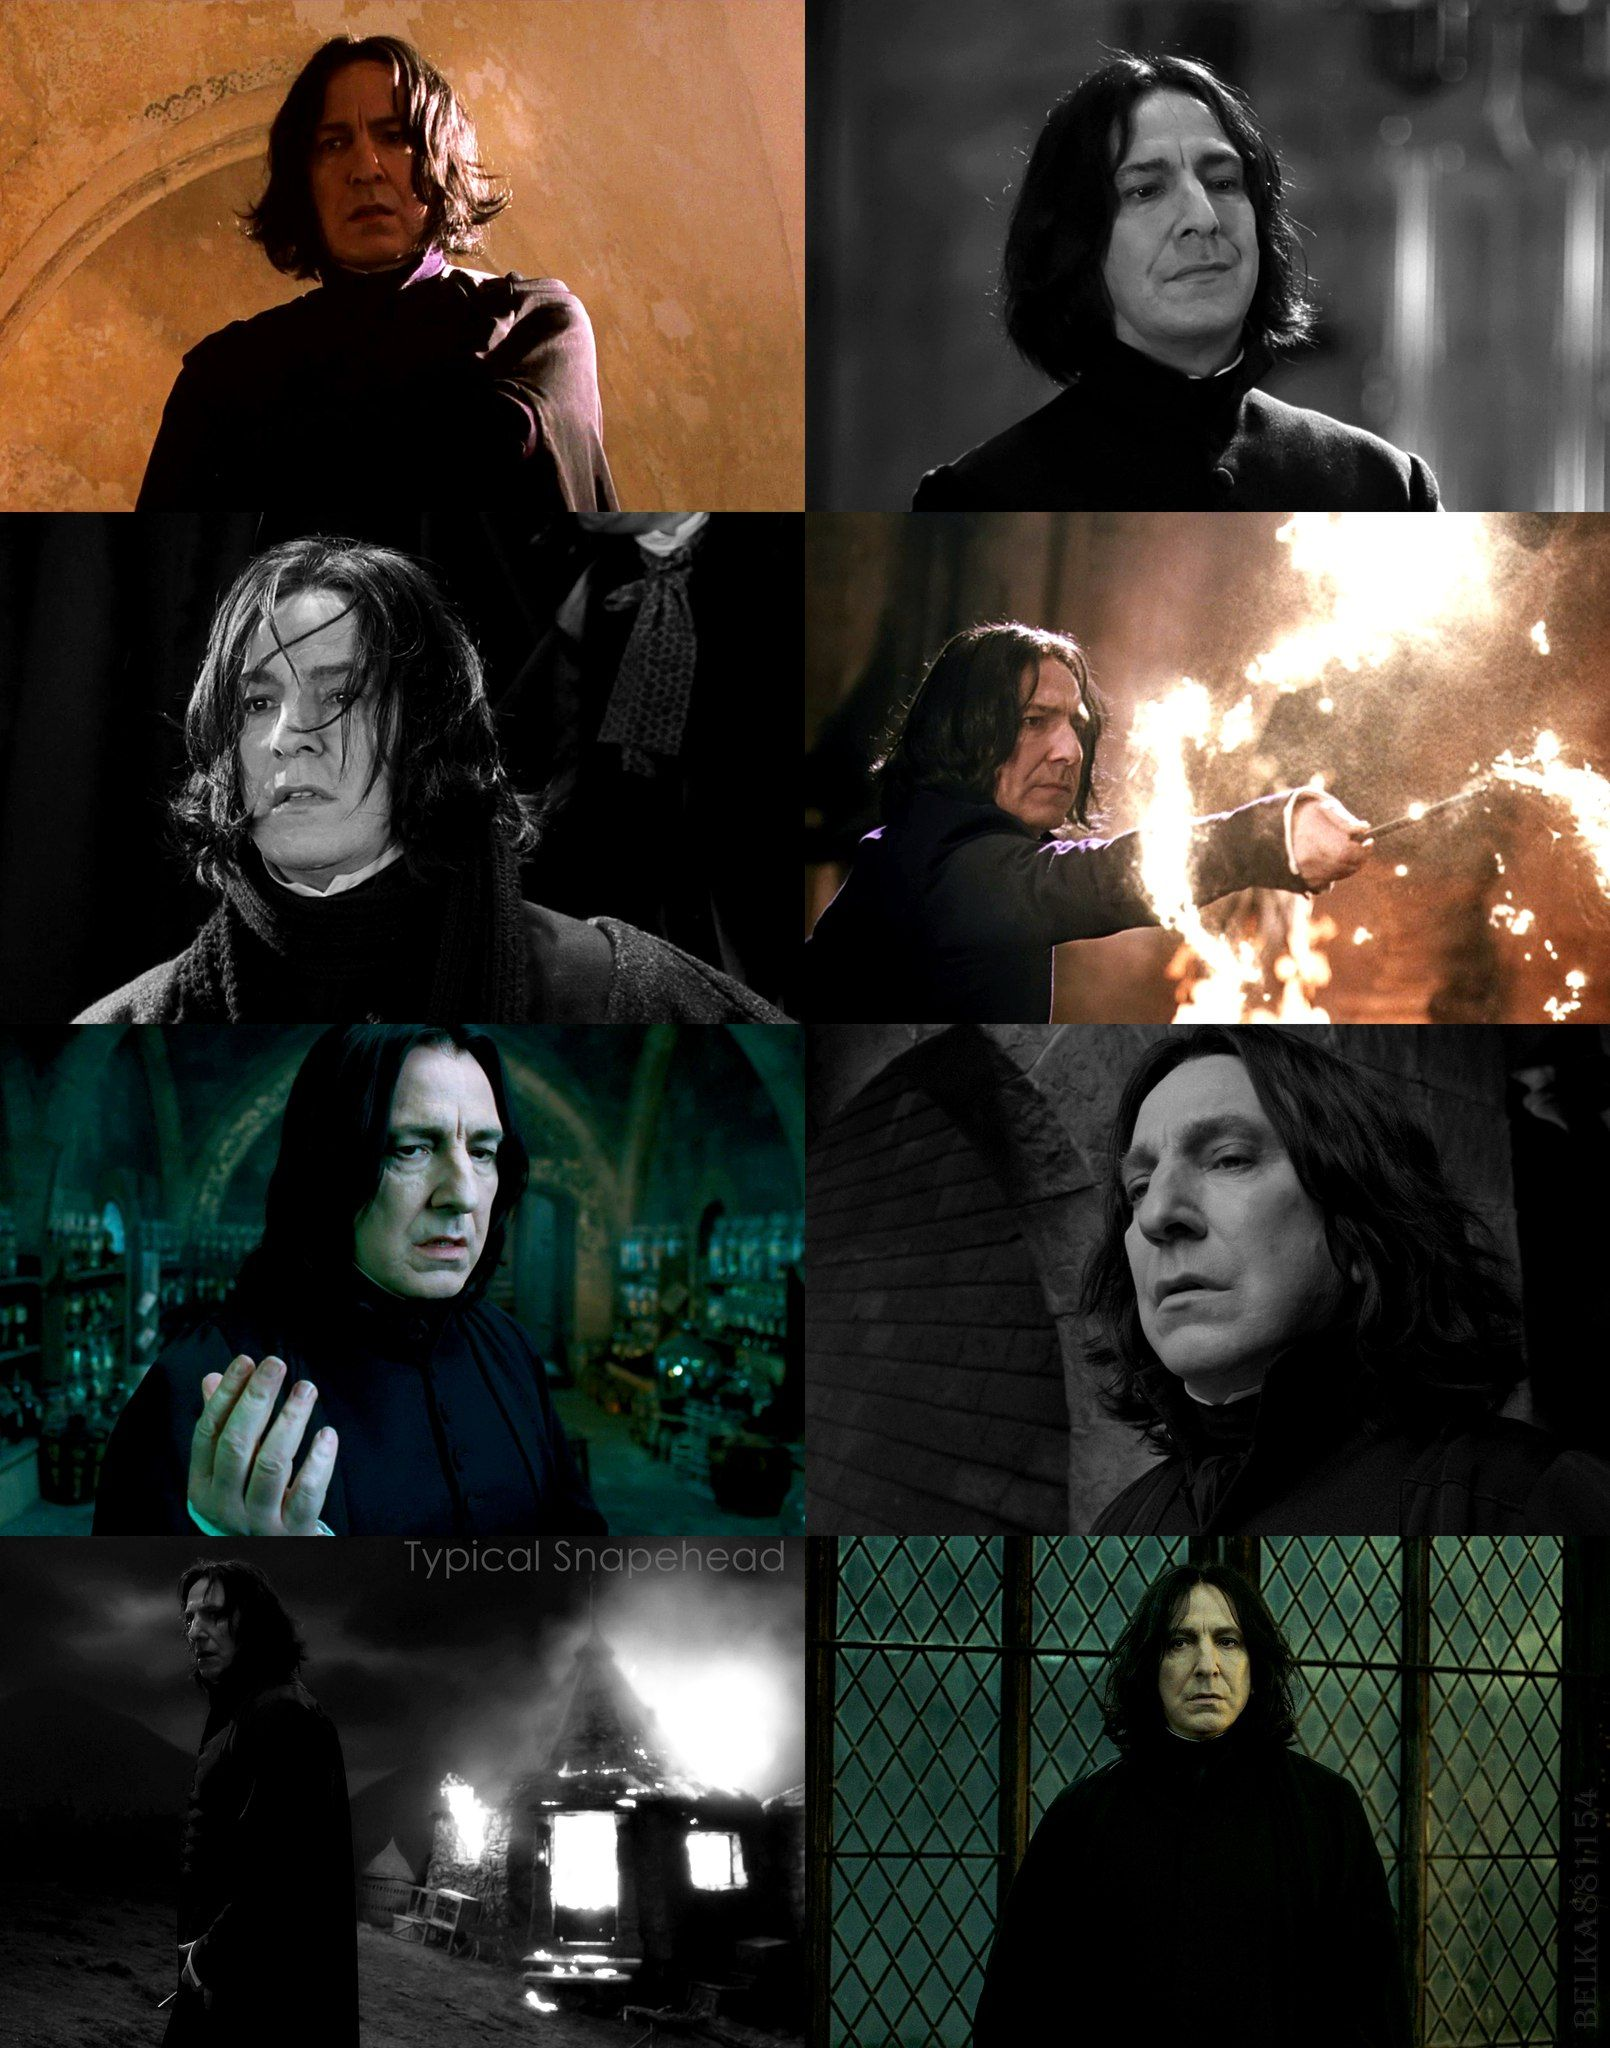 Pin By Lala Depp On Severus Snape Harry Potter Severus Snape Harry Potter Severus Snape Harry